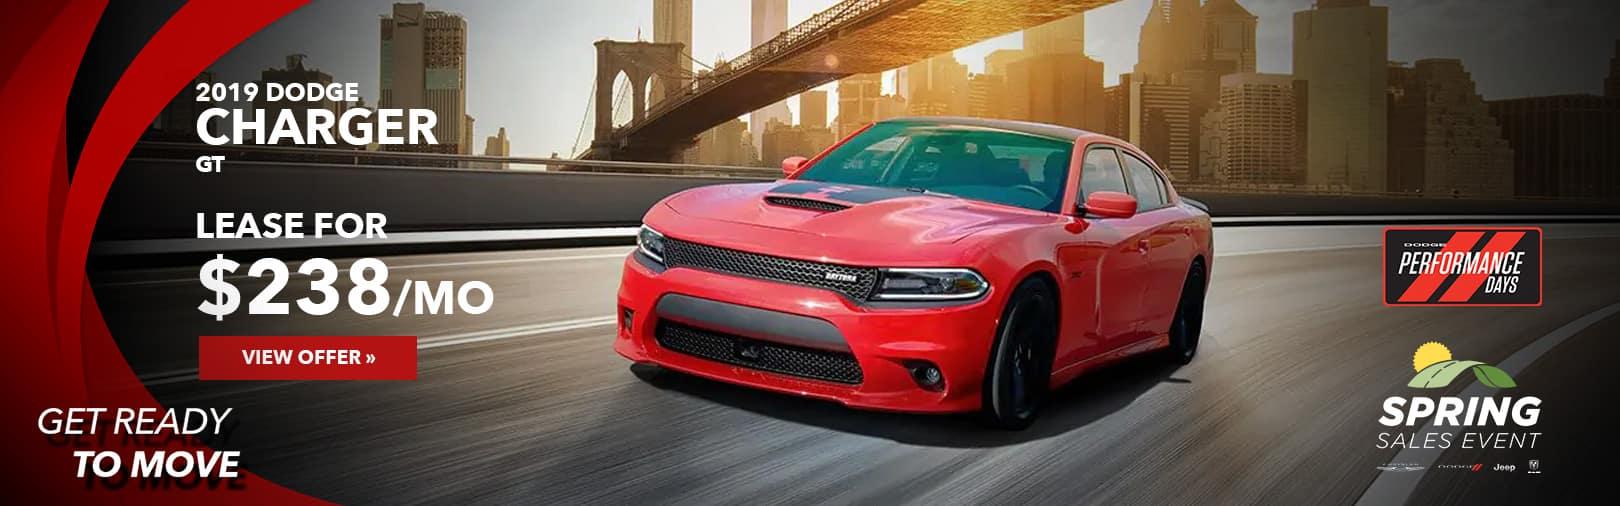 Dodge Charger April Lease offer